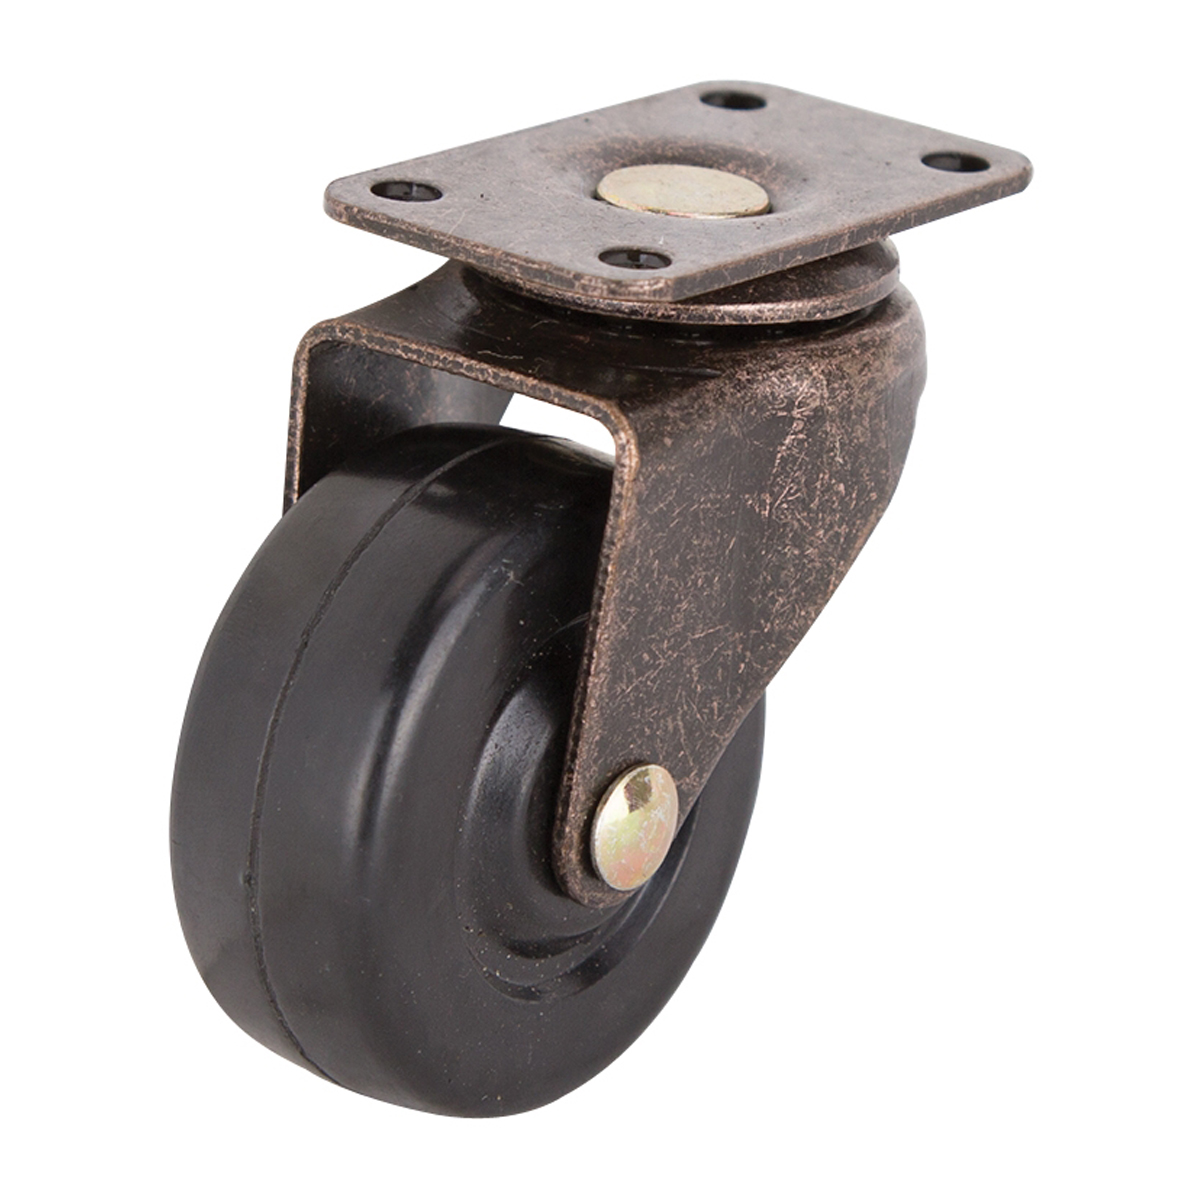 Picture of ProSource JC-D06-PS Swivel Caster, 2 in Dia Wheel, Rubber Wheel, Black, 90 lb